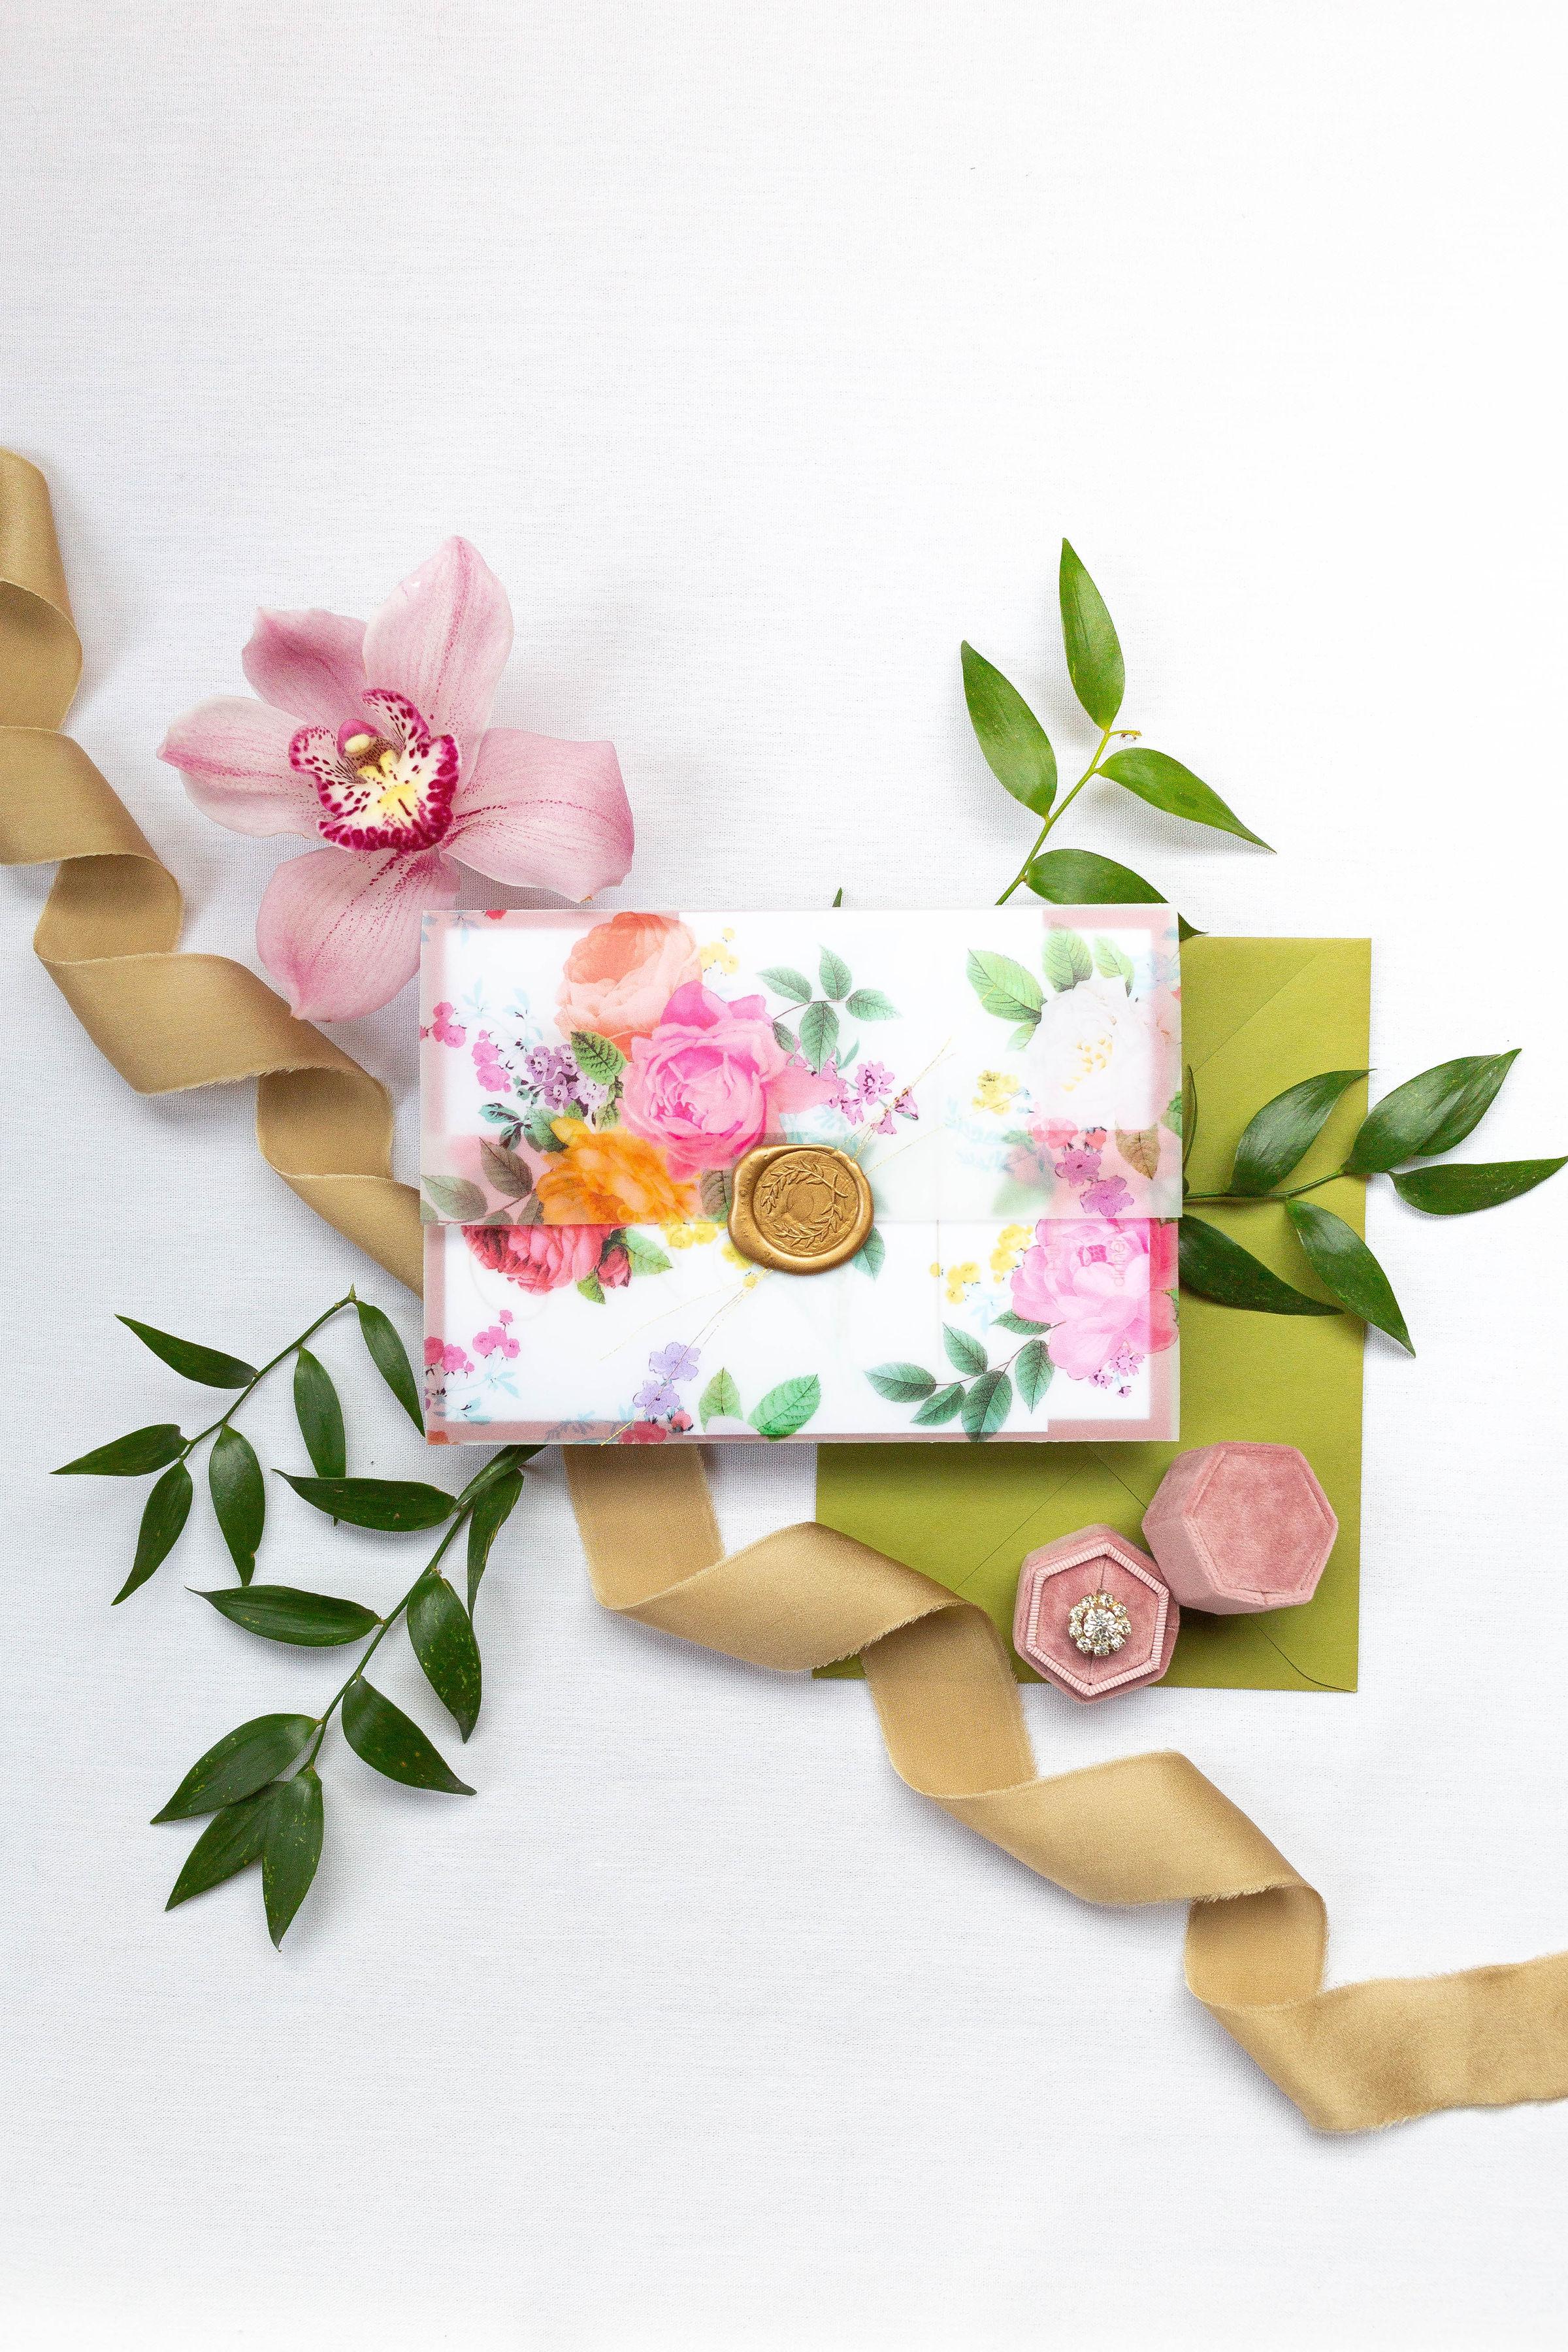 custom invitations - let's get started on your bespoke design